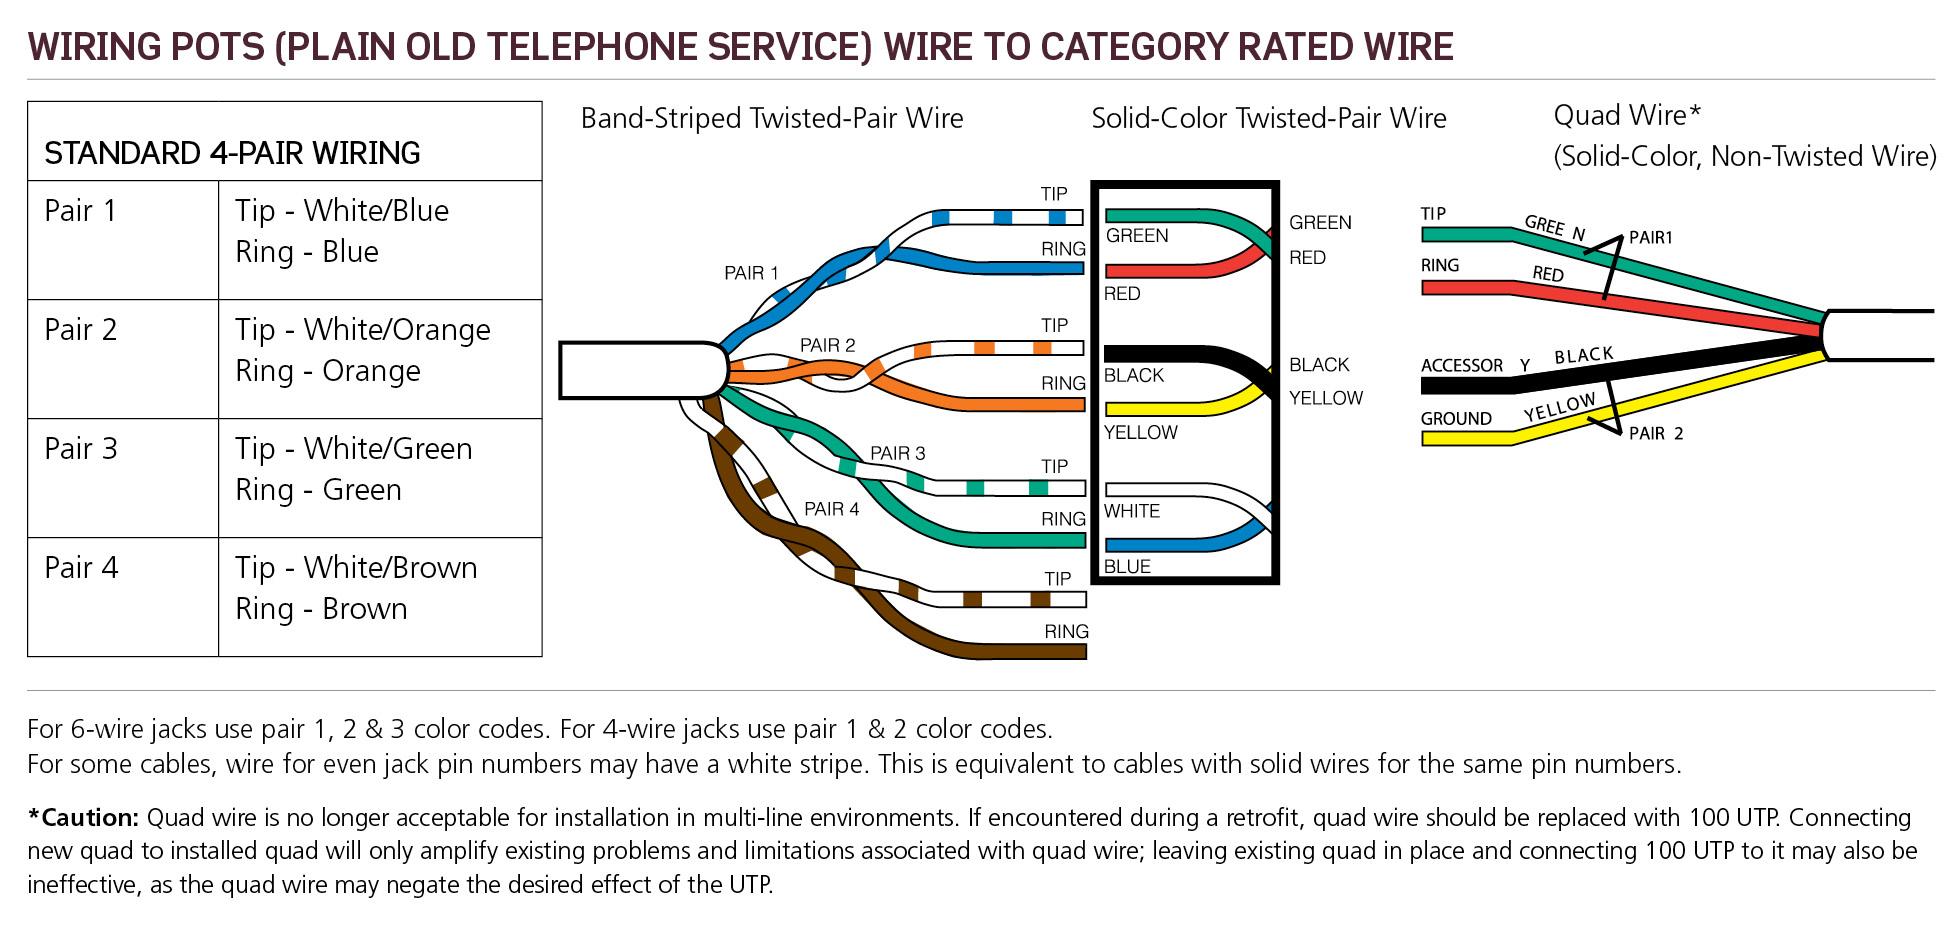 cat 5 telephone wiring wiring diagram portal cat 6 wiring diagram cat 5 telephone wiring diagram [ 1960 x 936 Pixel ]